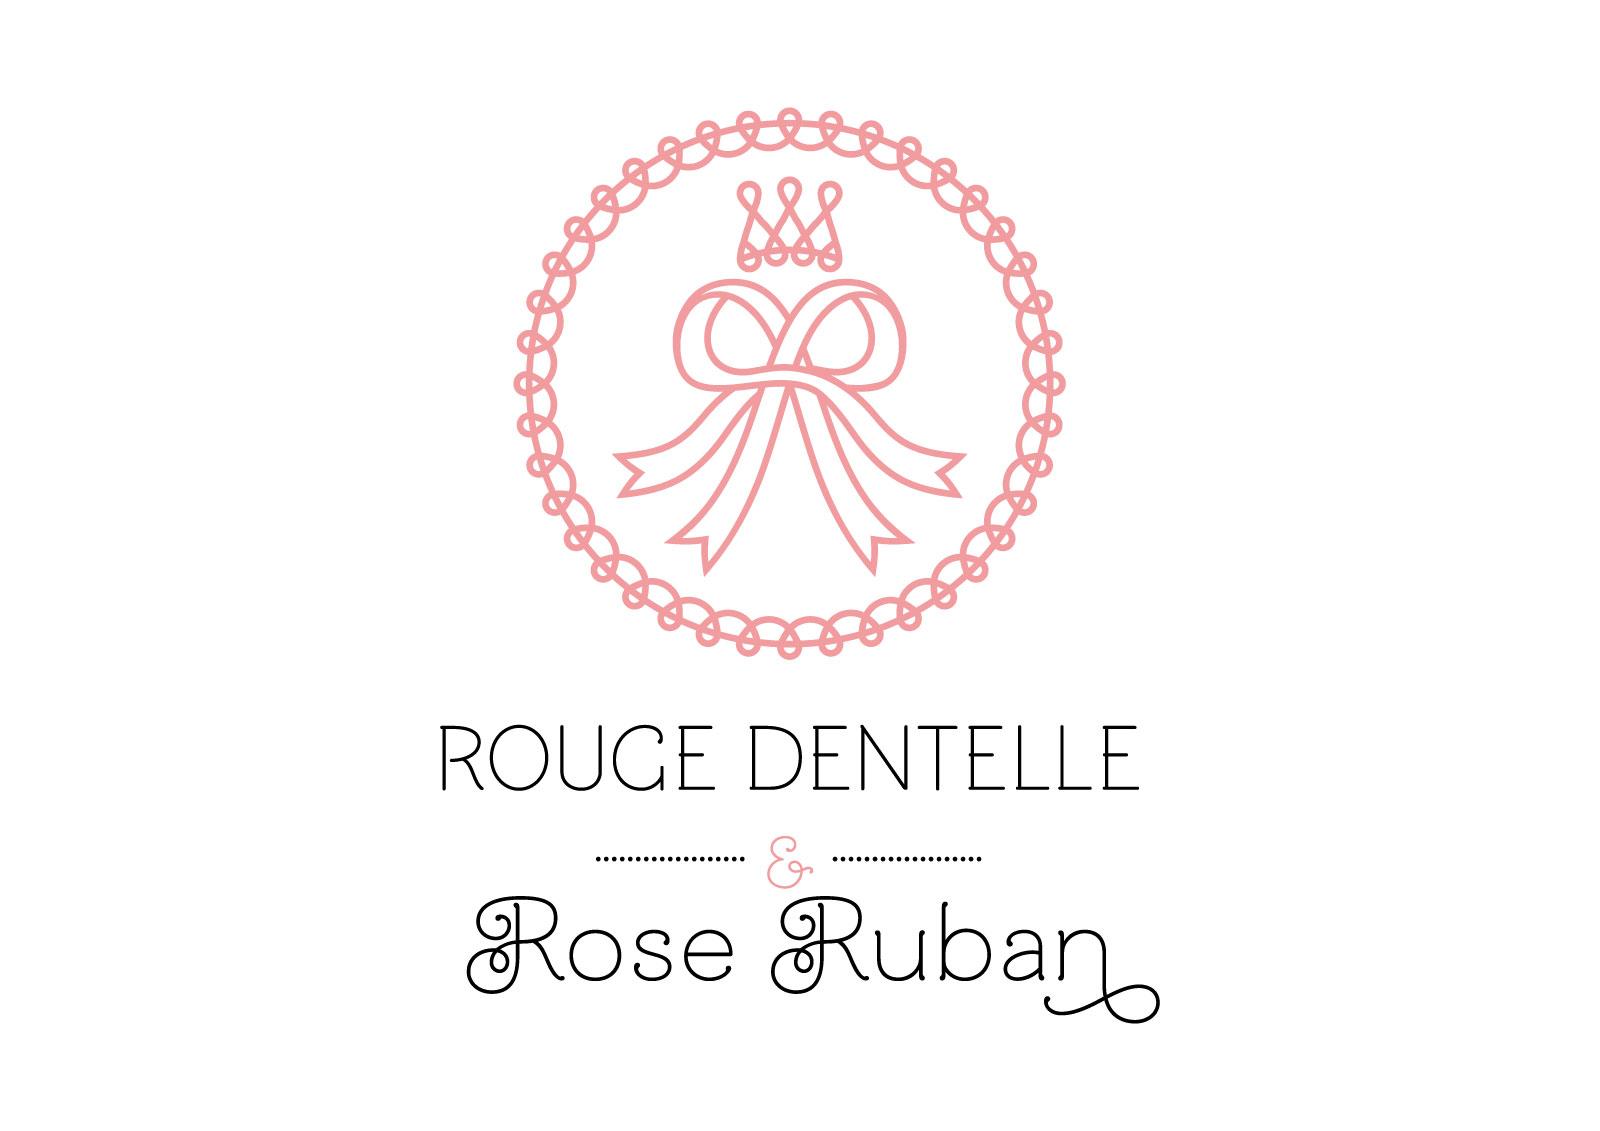 Logo of french lolita association